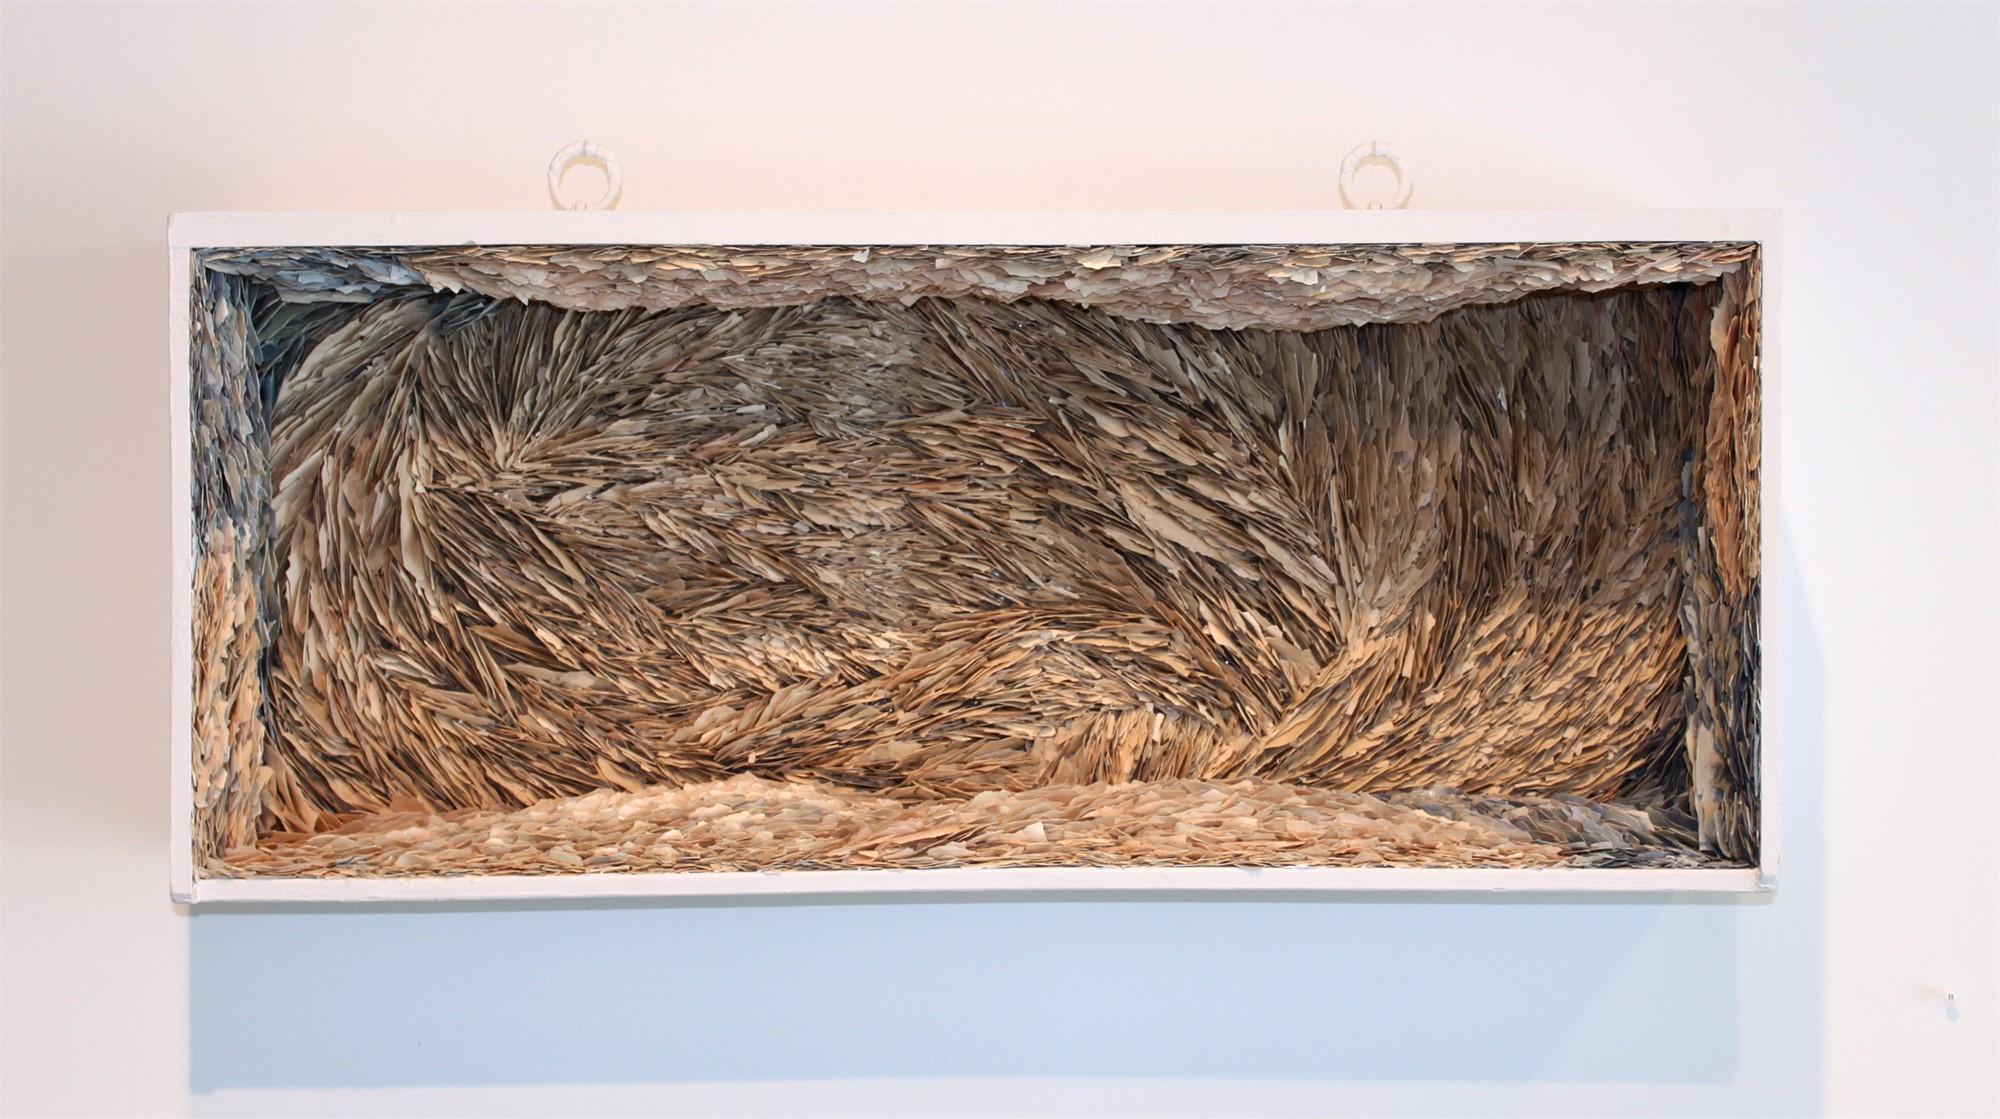 Large Dresser Drawer I by Jessica Dupuis